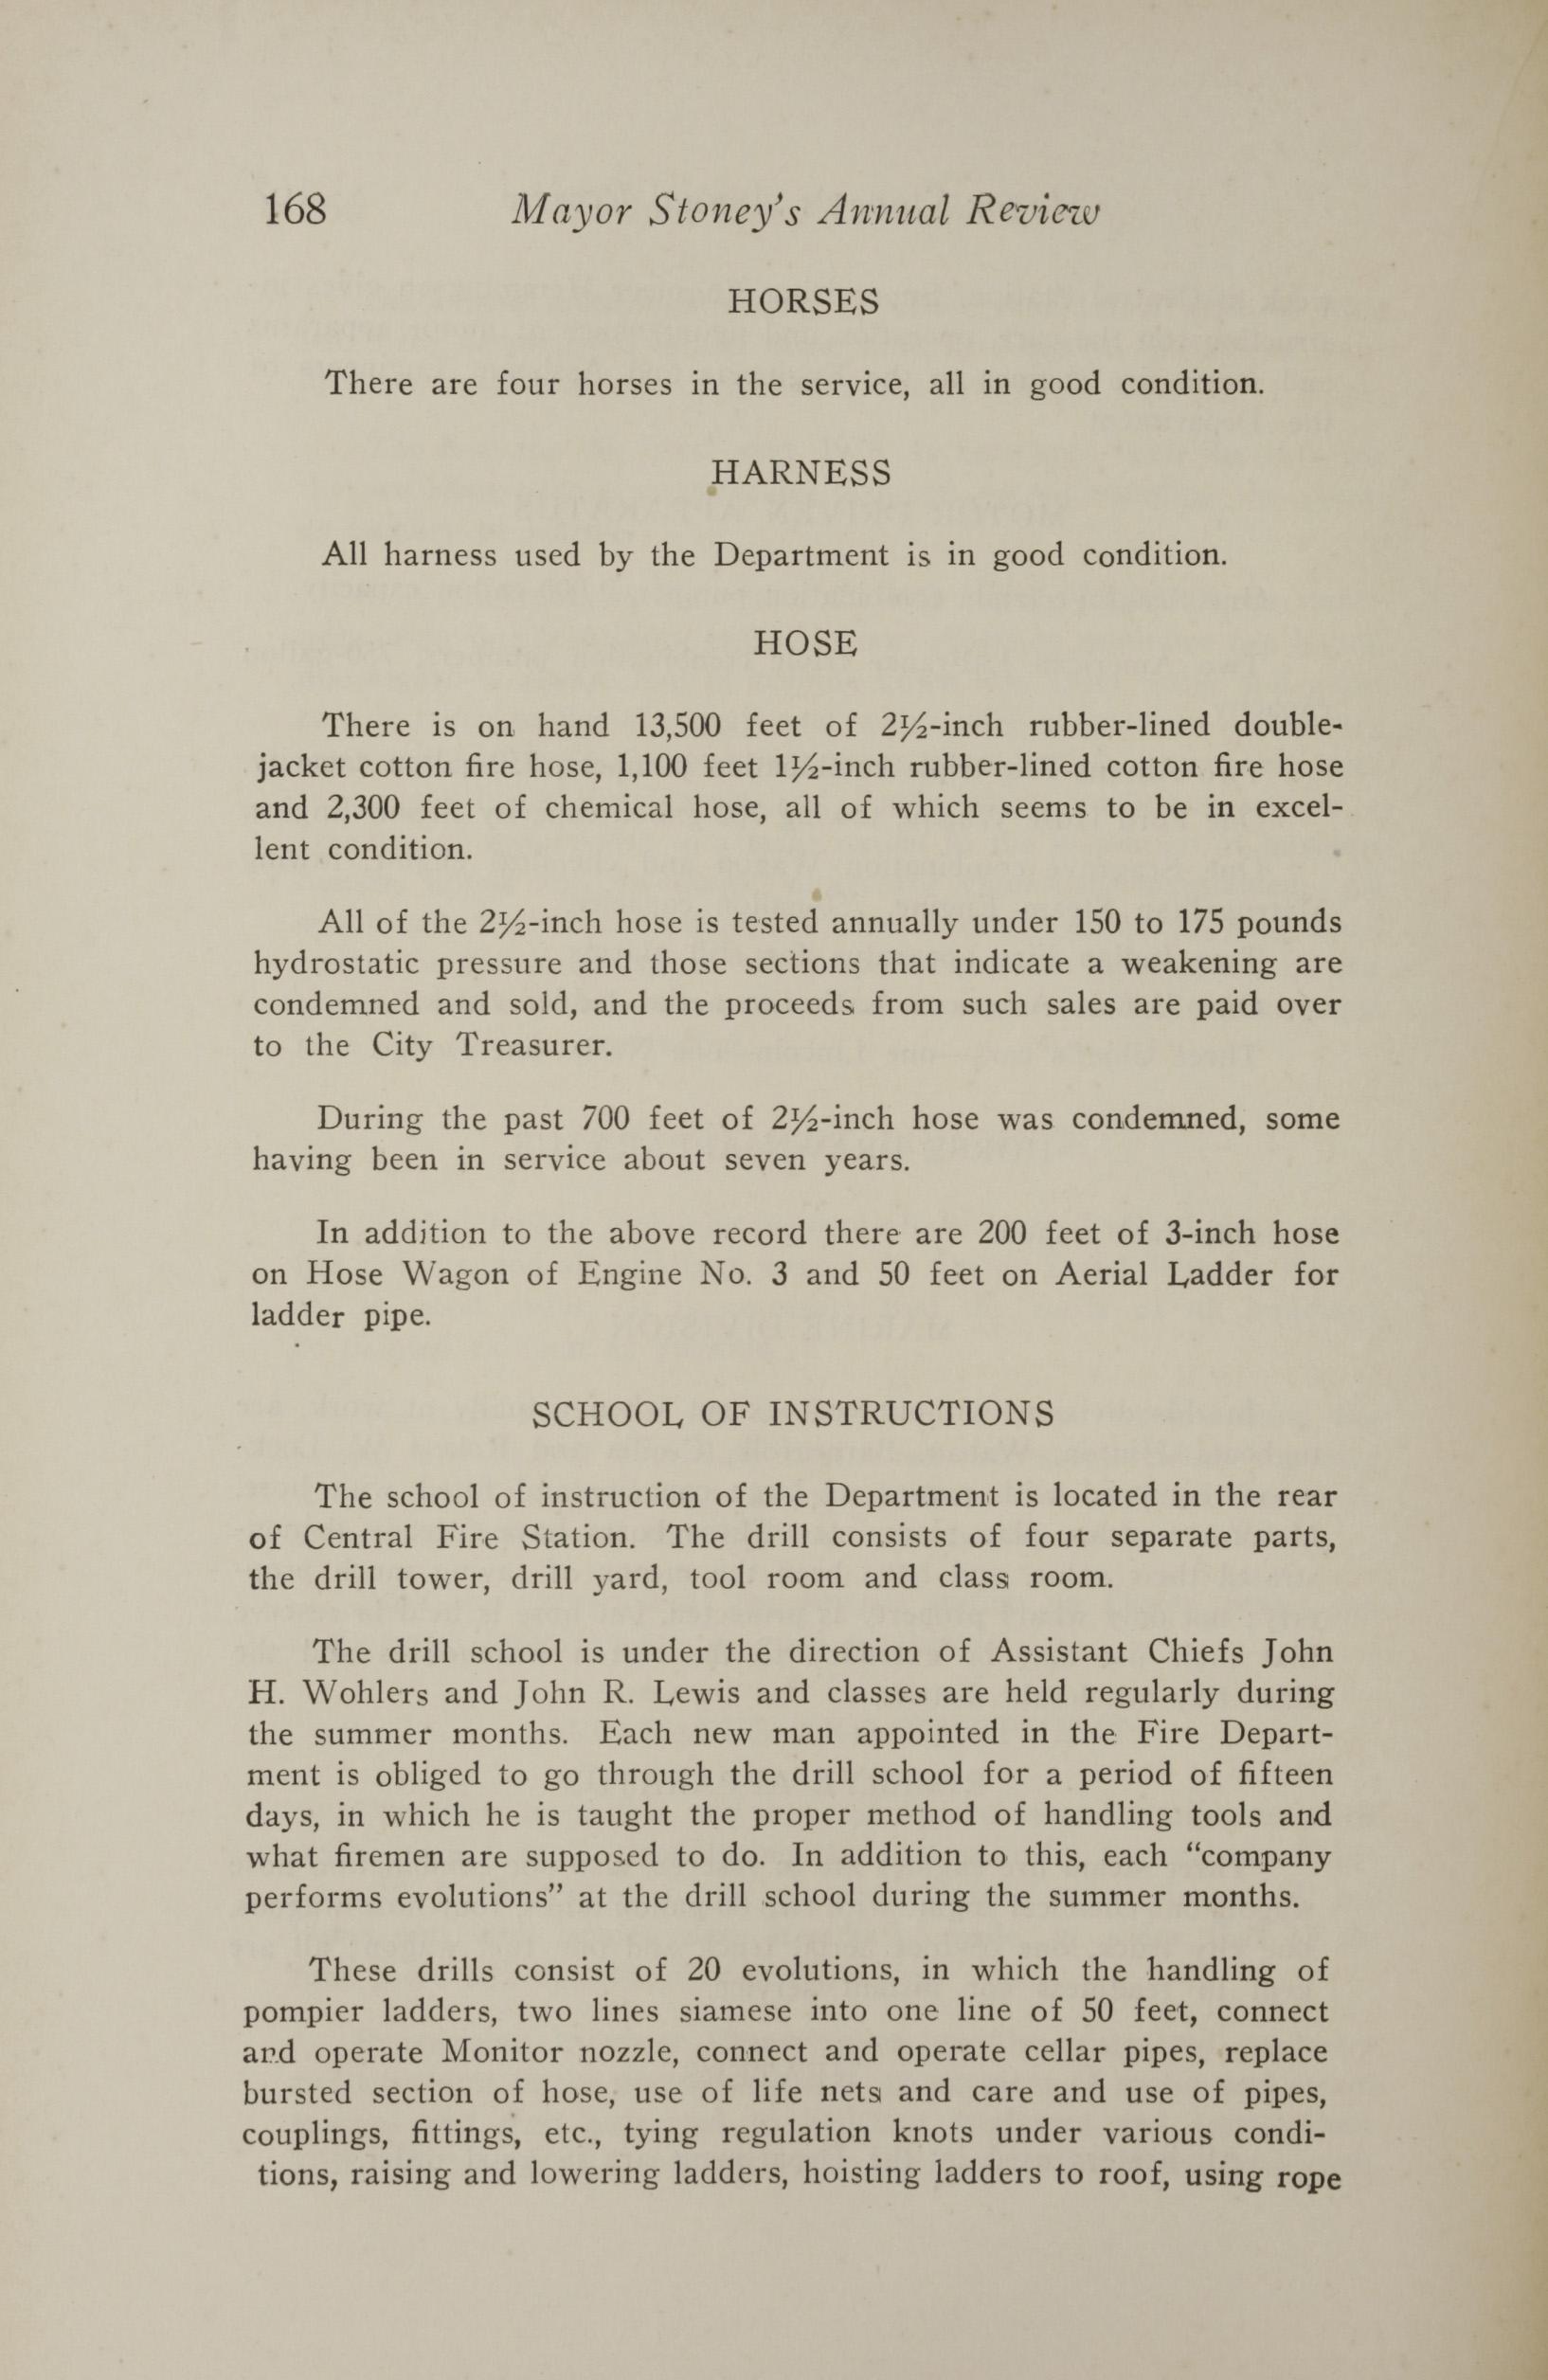 Charleston Yearbook, 1928, page 168